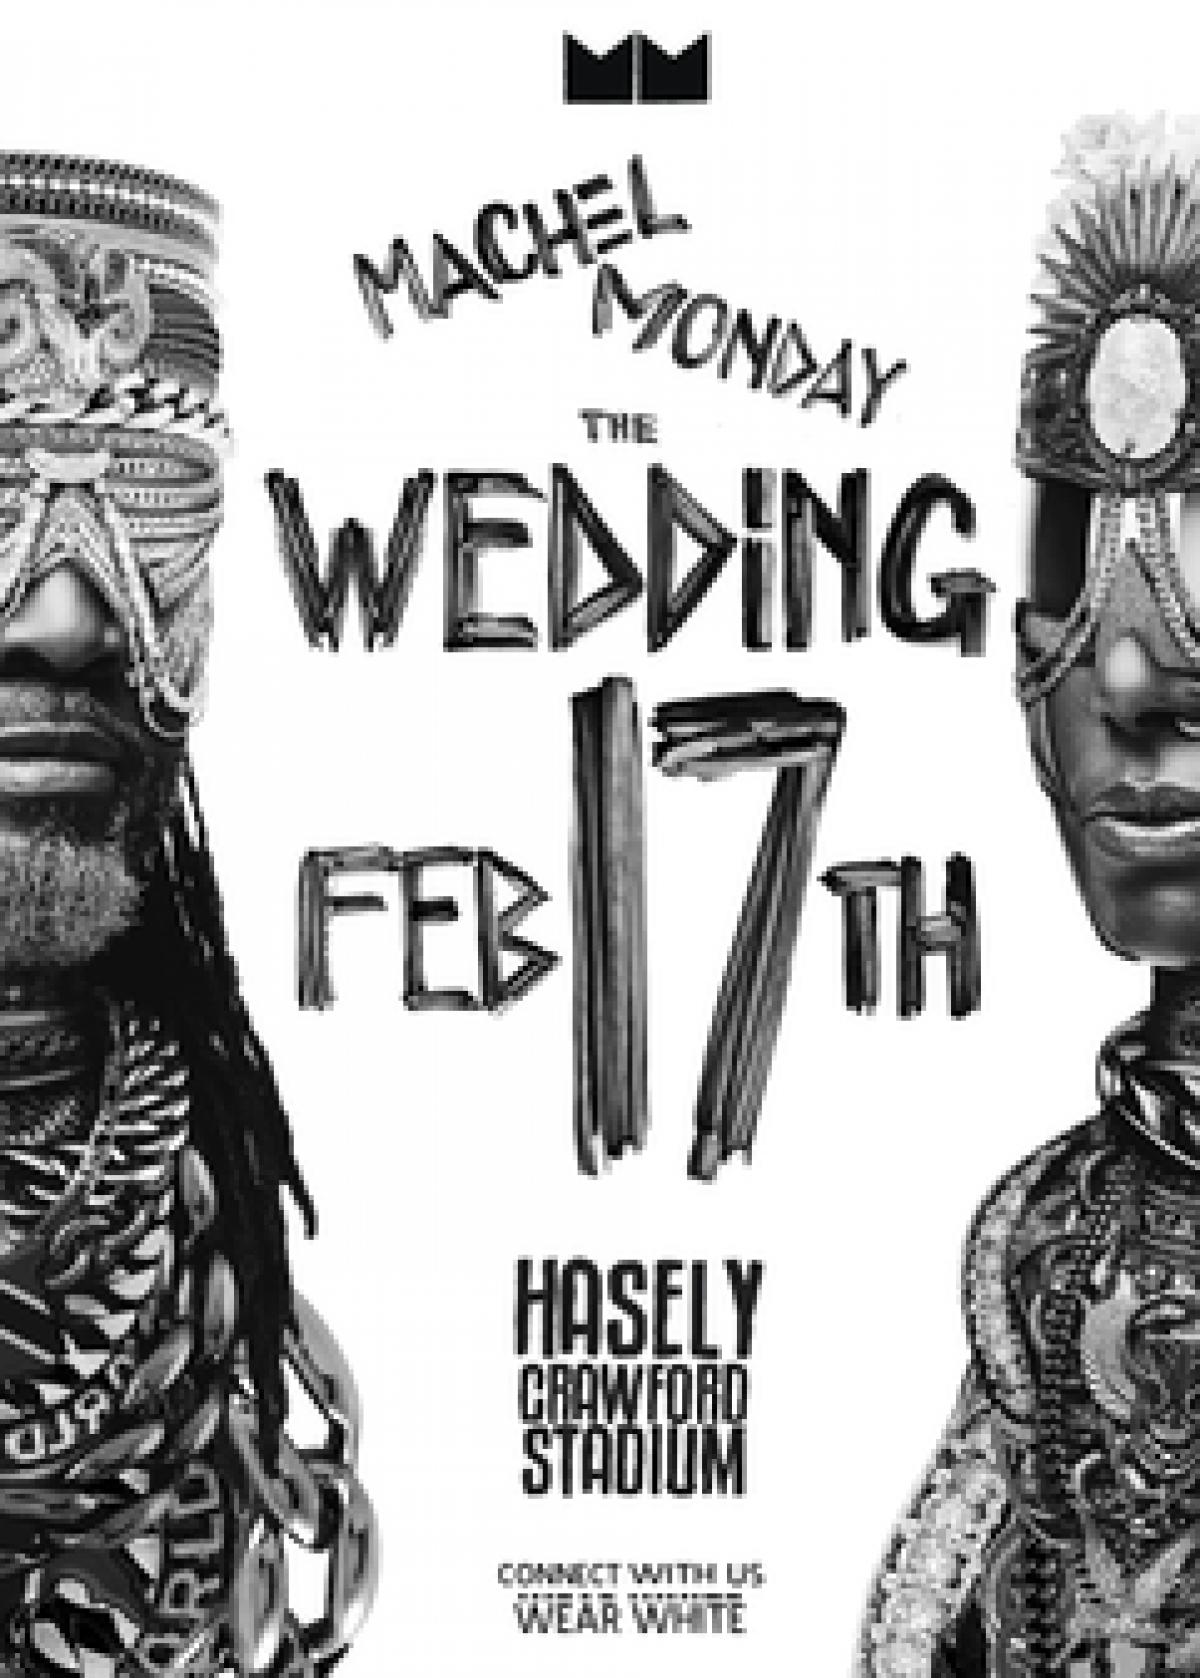 Machel Monday 'The Wedding' flyer or graphic.